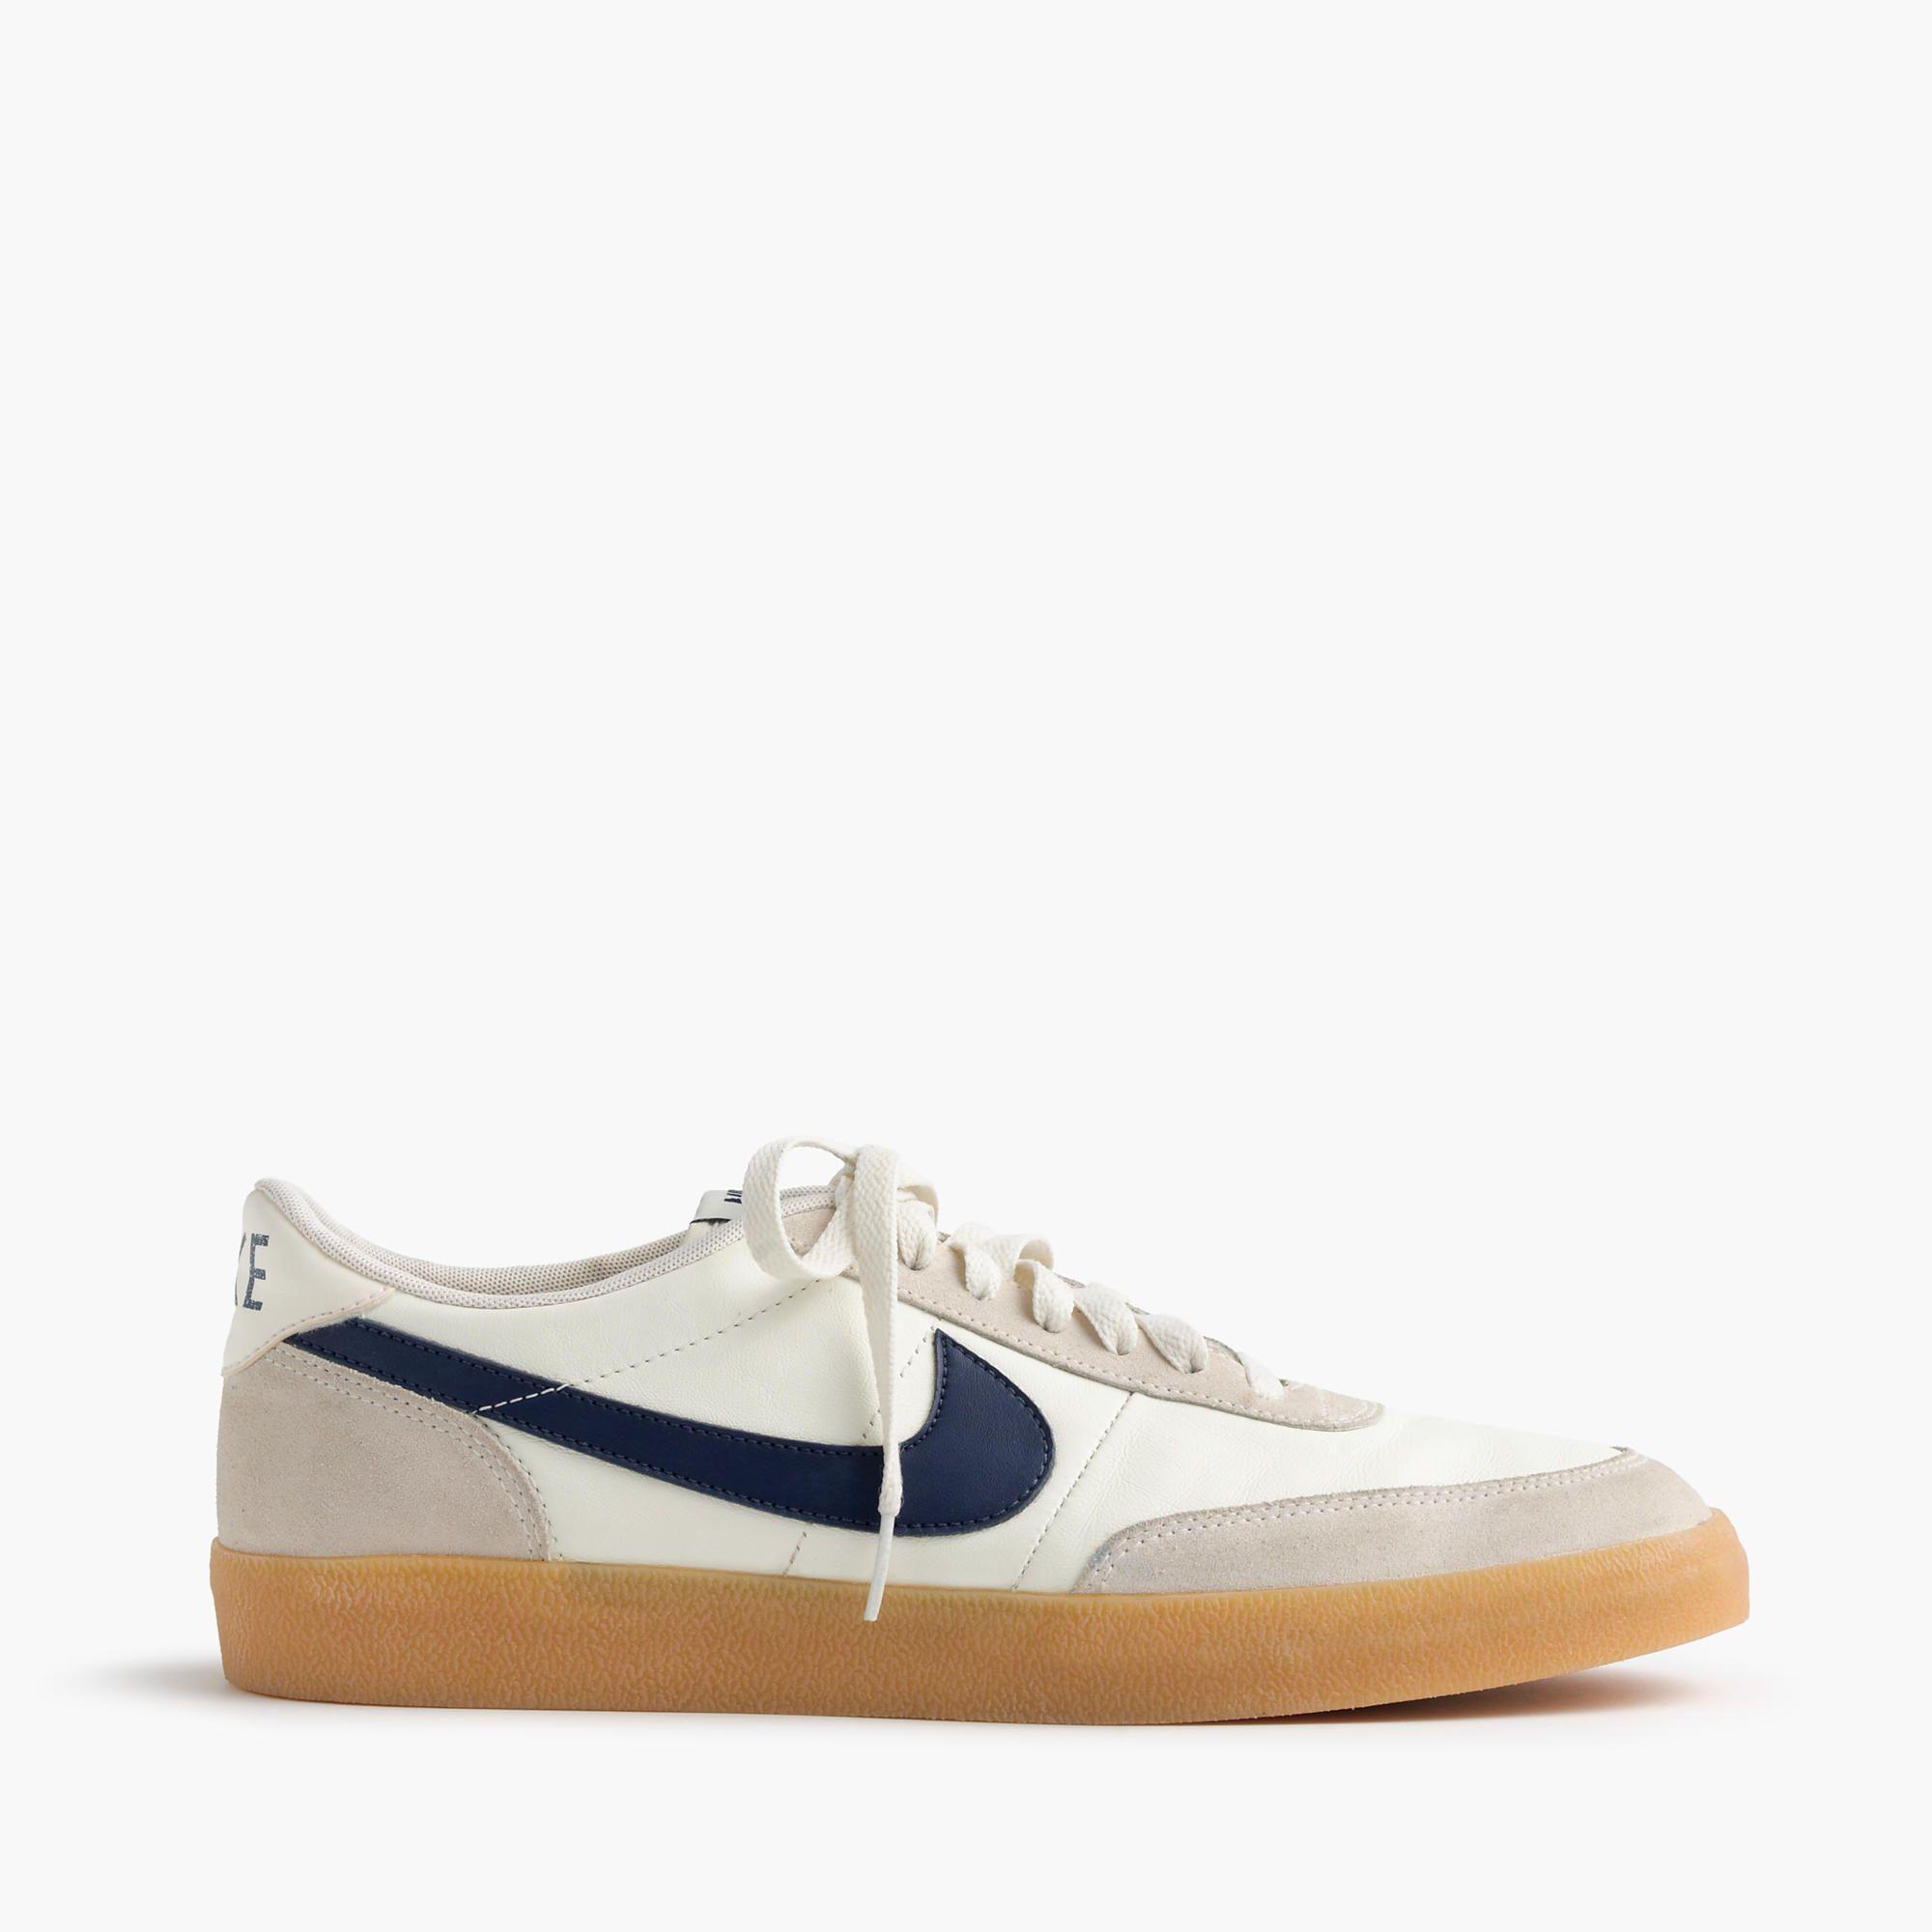 newest 9b814 2ad37 Nike for J.Crew Killshot 2 sneakers 90